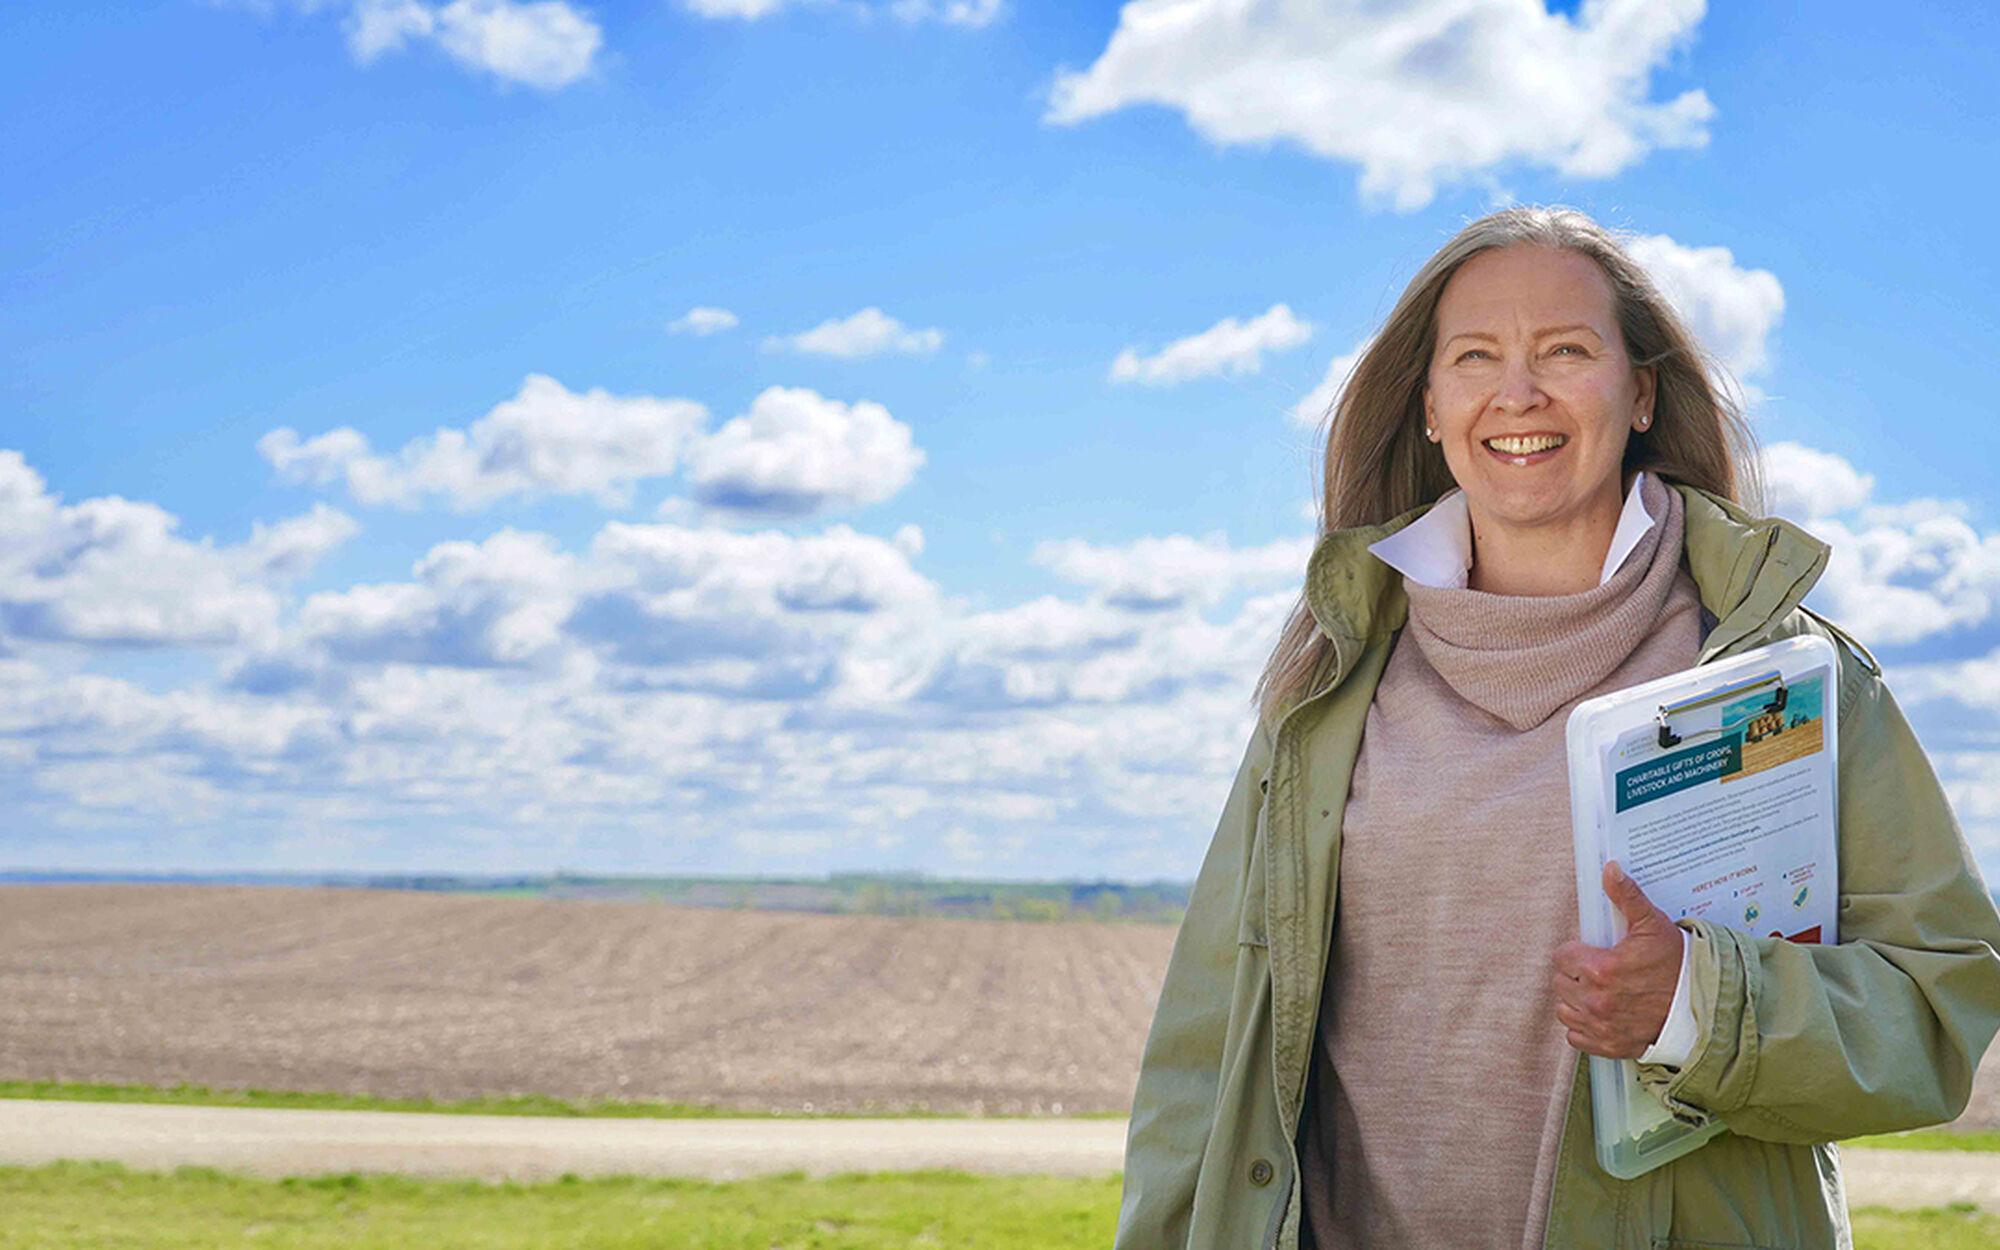 Gift planner Lisa Barton discussing donating farmland